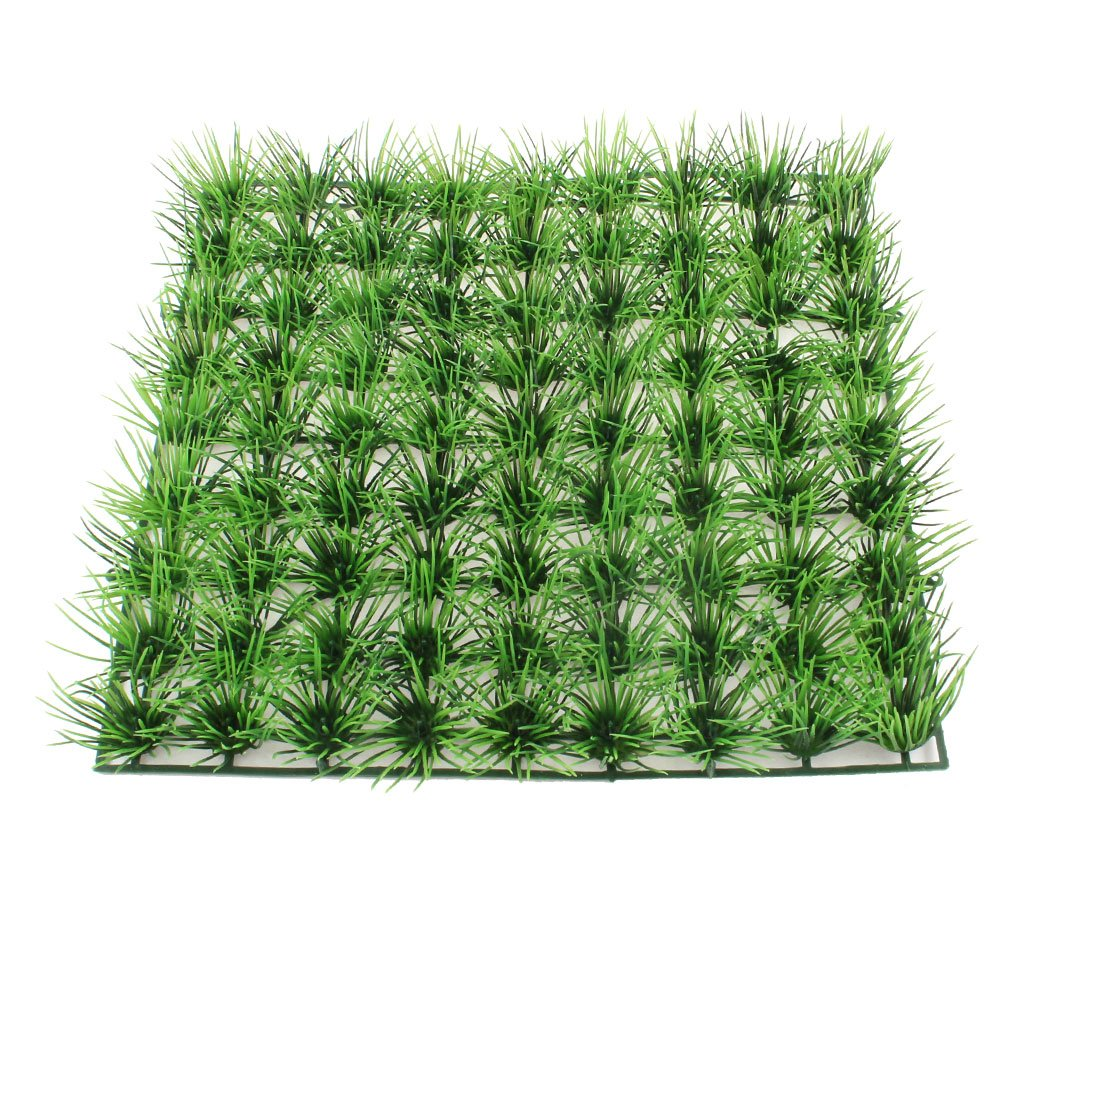 uxcell 人工水草 水槽用 アクアリウム 装飾 グリーン プラスチック グラス 人造 ローン 25 x 25cm B013Y63BOS type4 type4